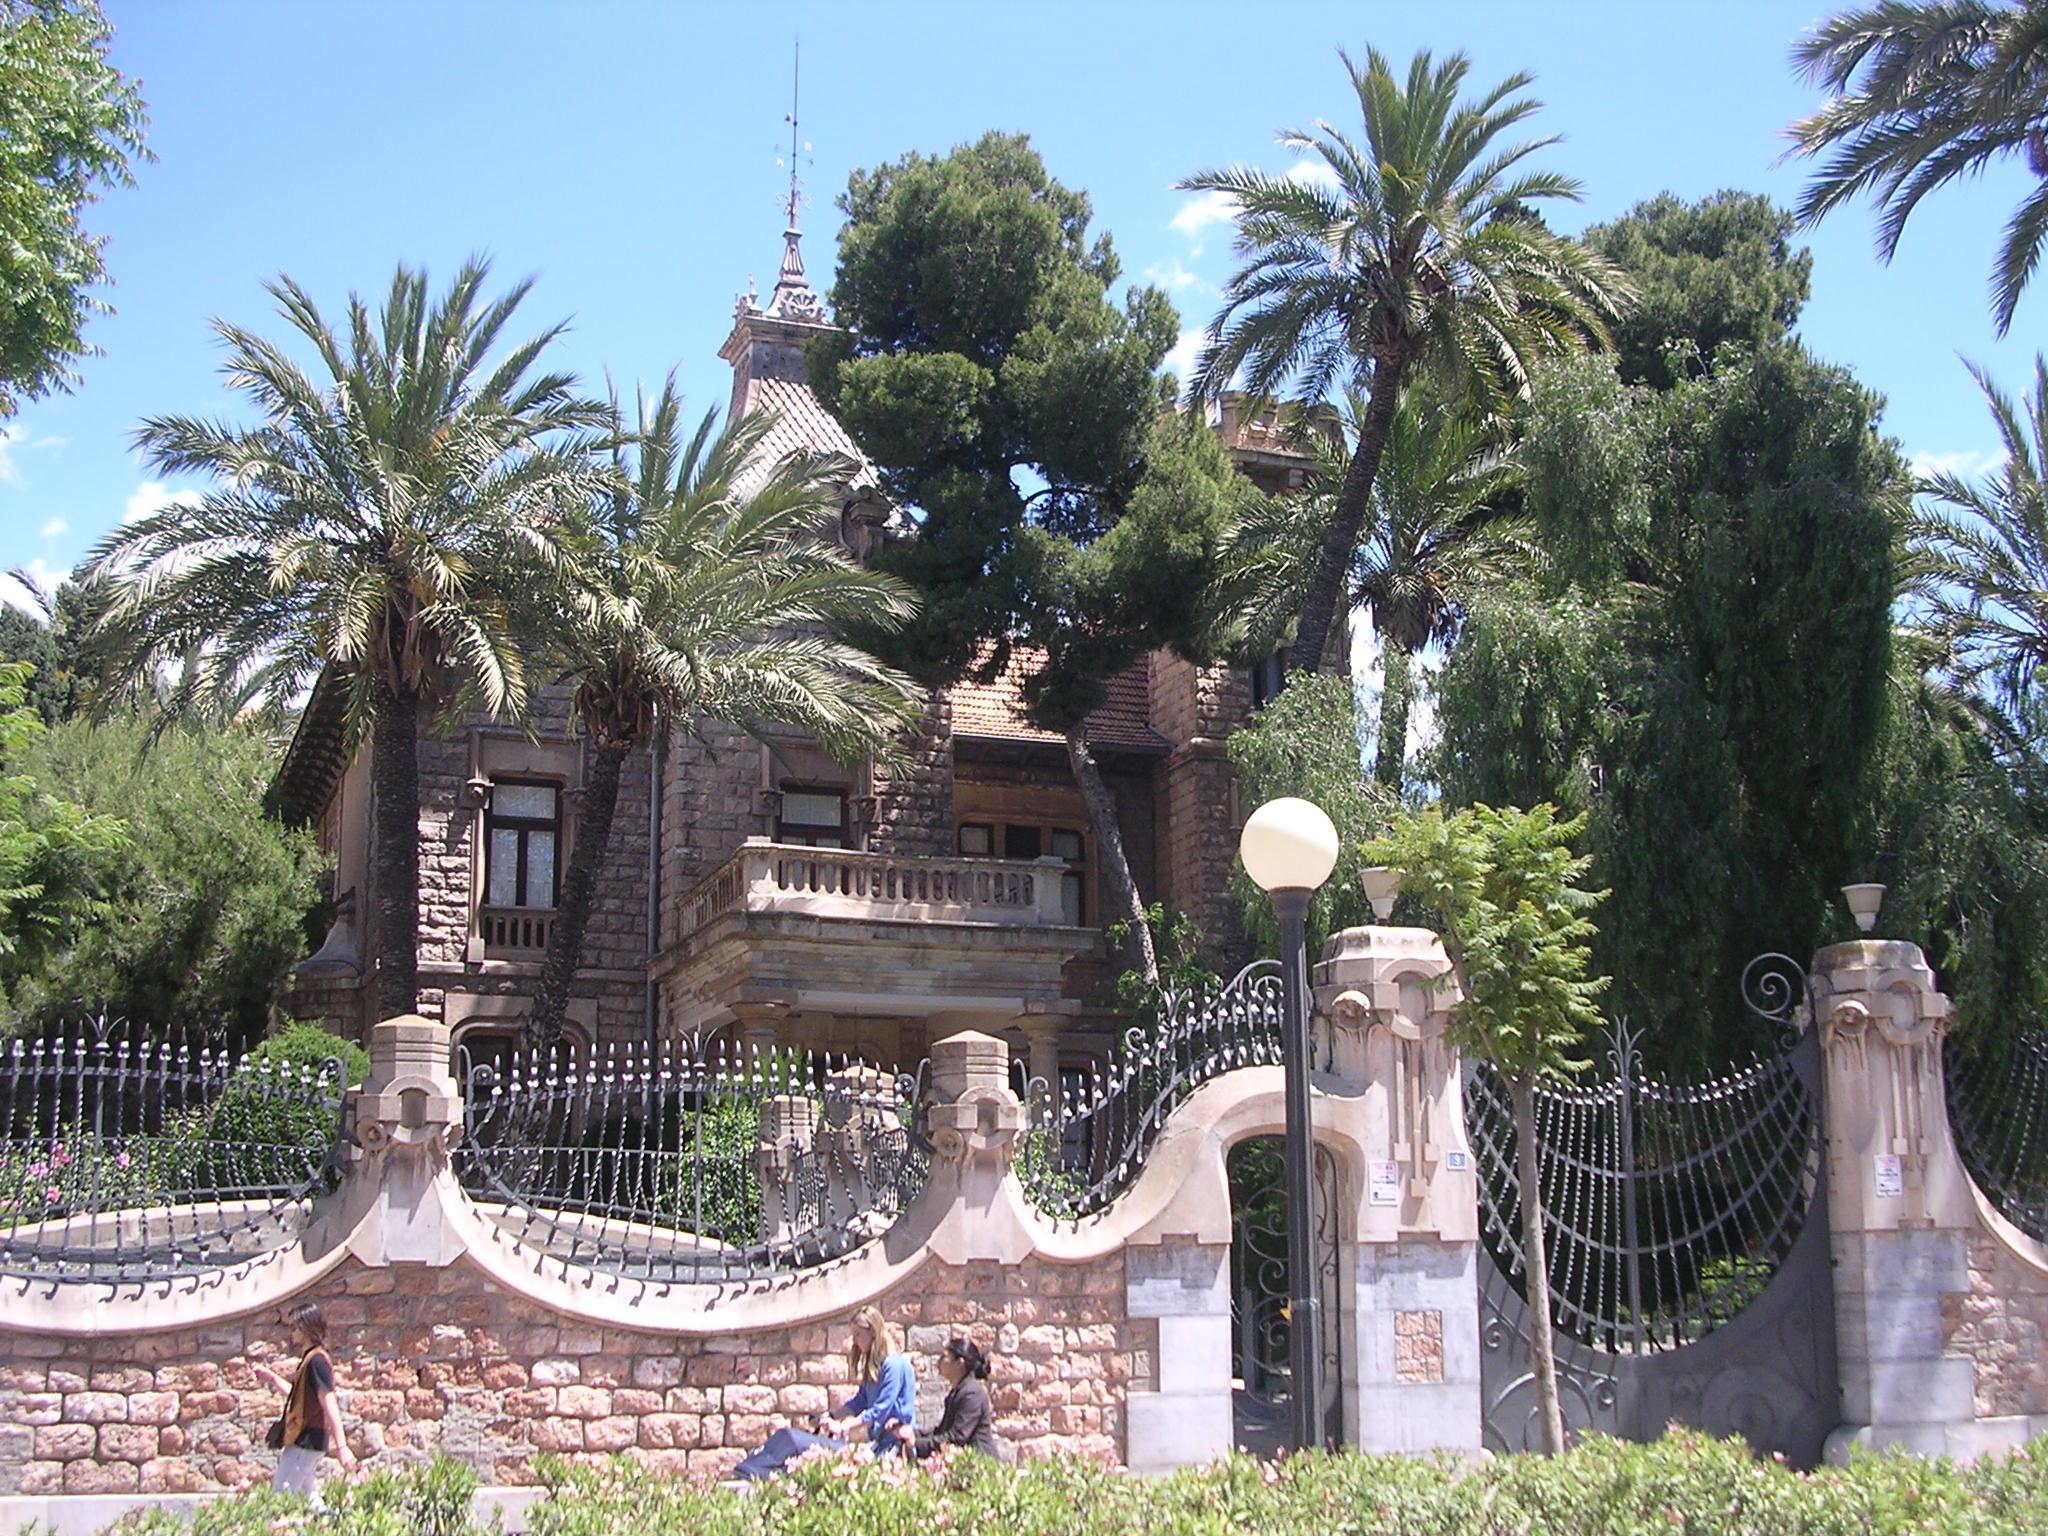 Depiction of Casa Zapata